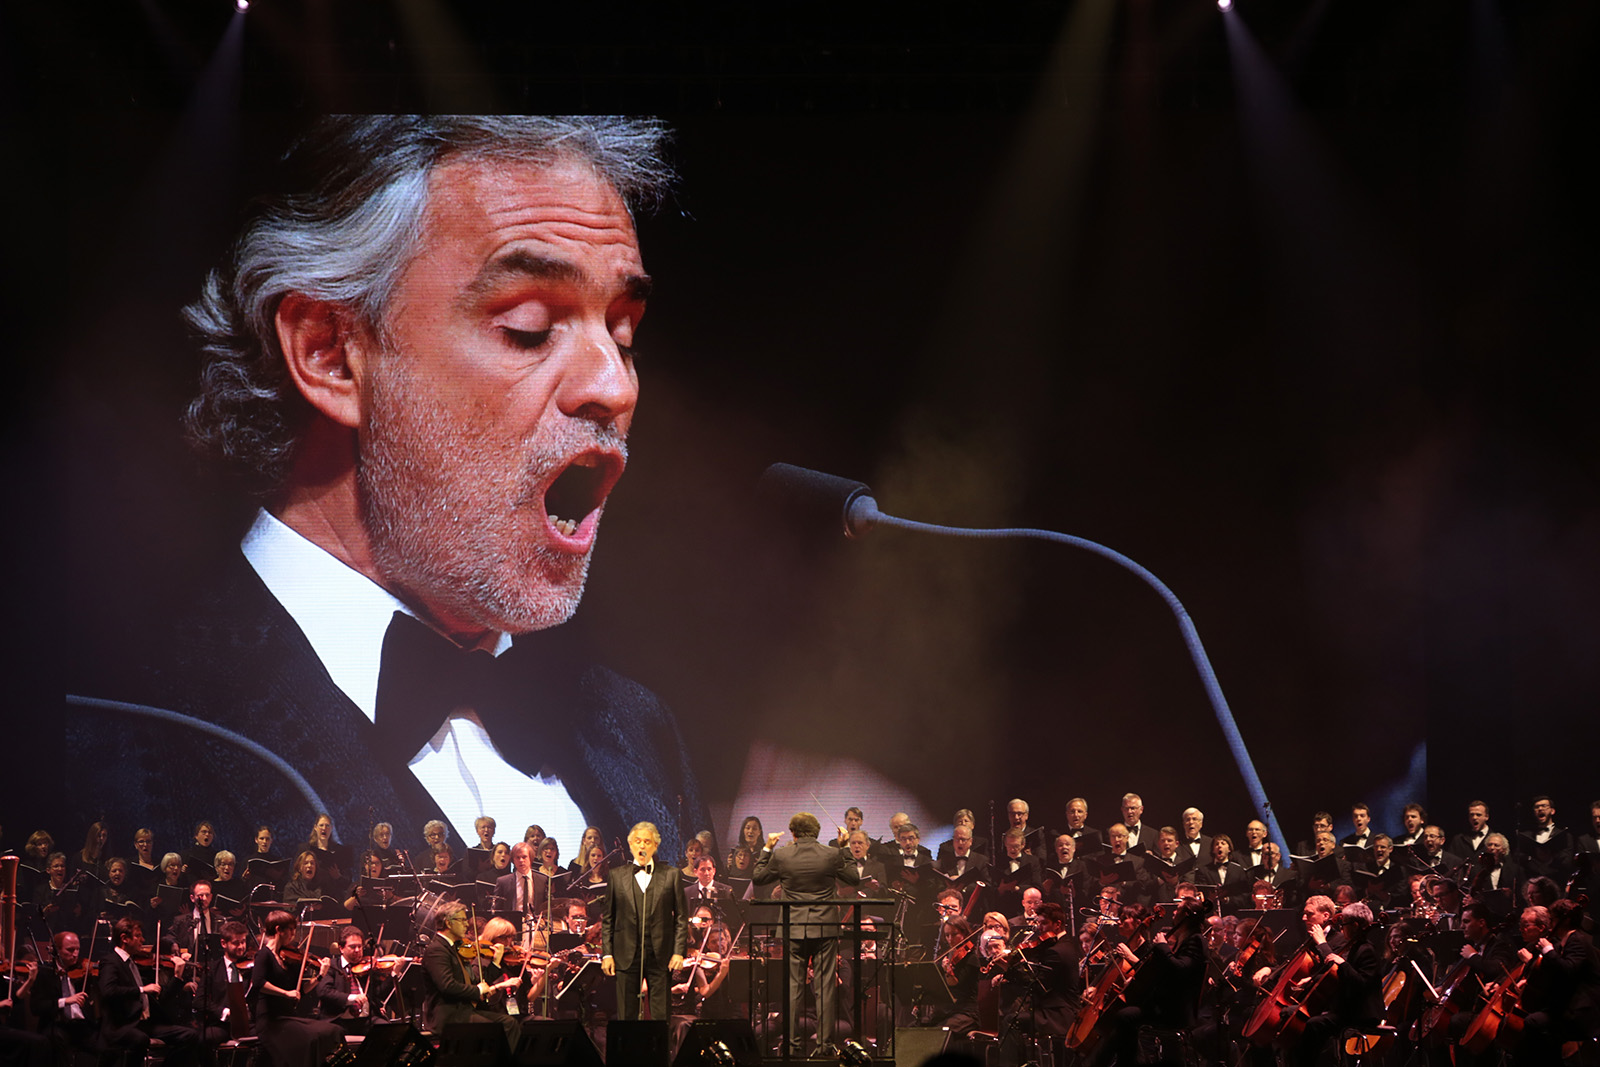 Andrea Bocelli auf Videowall mit Orchester vor dem Mikrofon